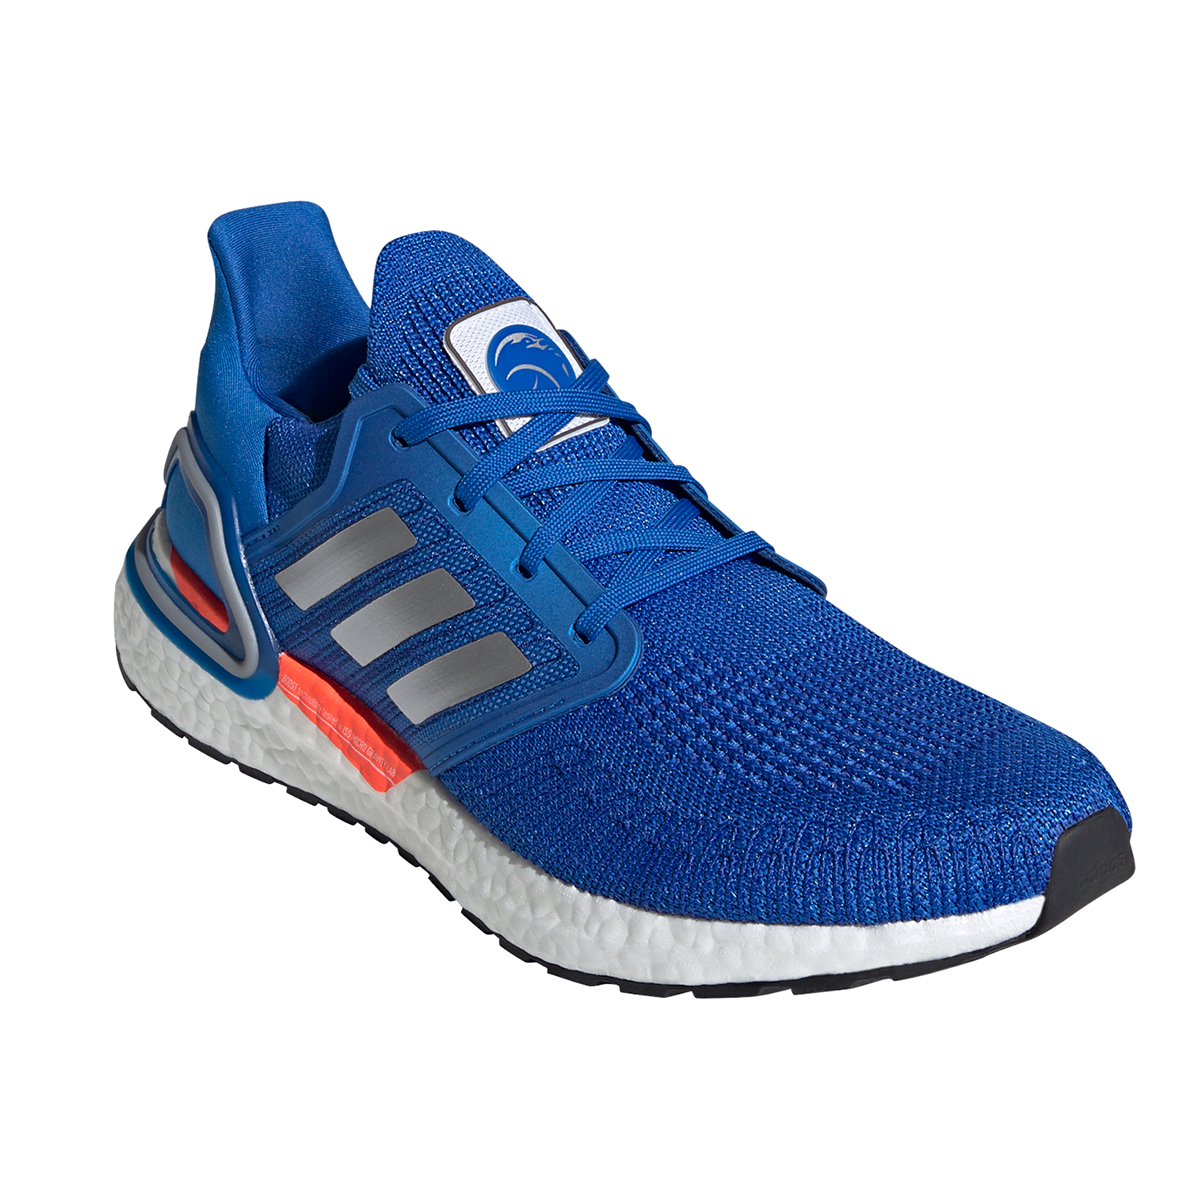 Men's Adidas Ultraboost 20 Running Shoe - Color: Football Blue - Size: 5 - Width: Regular, Football Blue, large, image 2